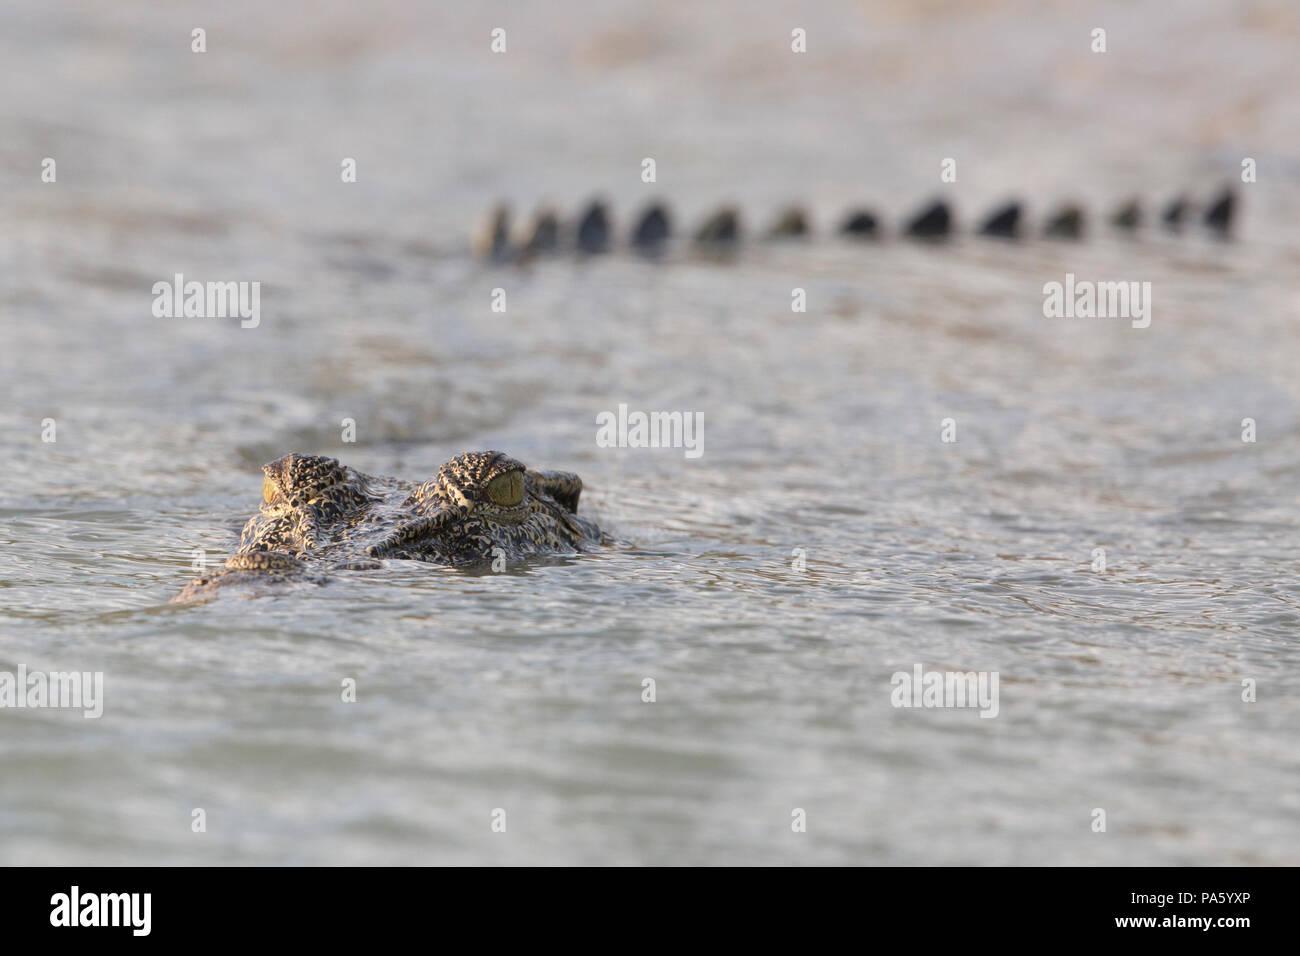 Saltwater Crocodile, Western Australia - Stock Image